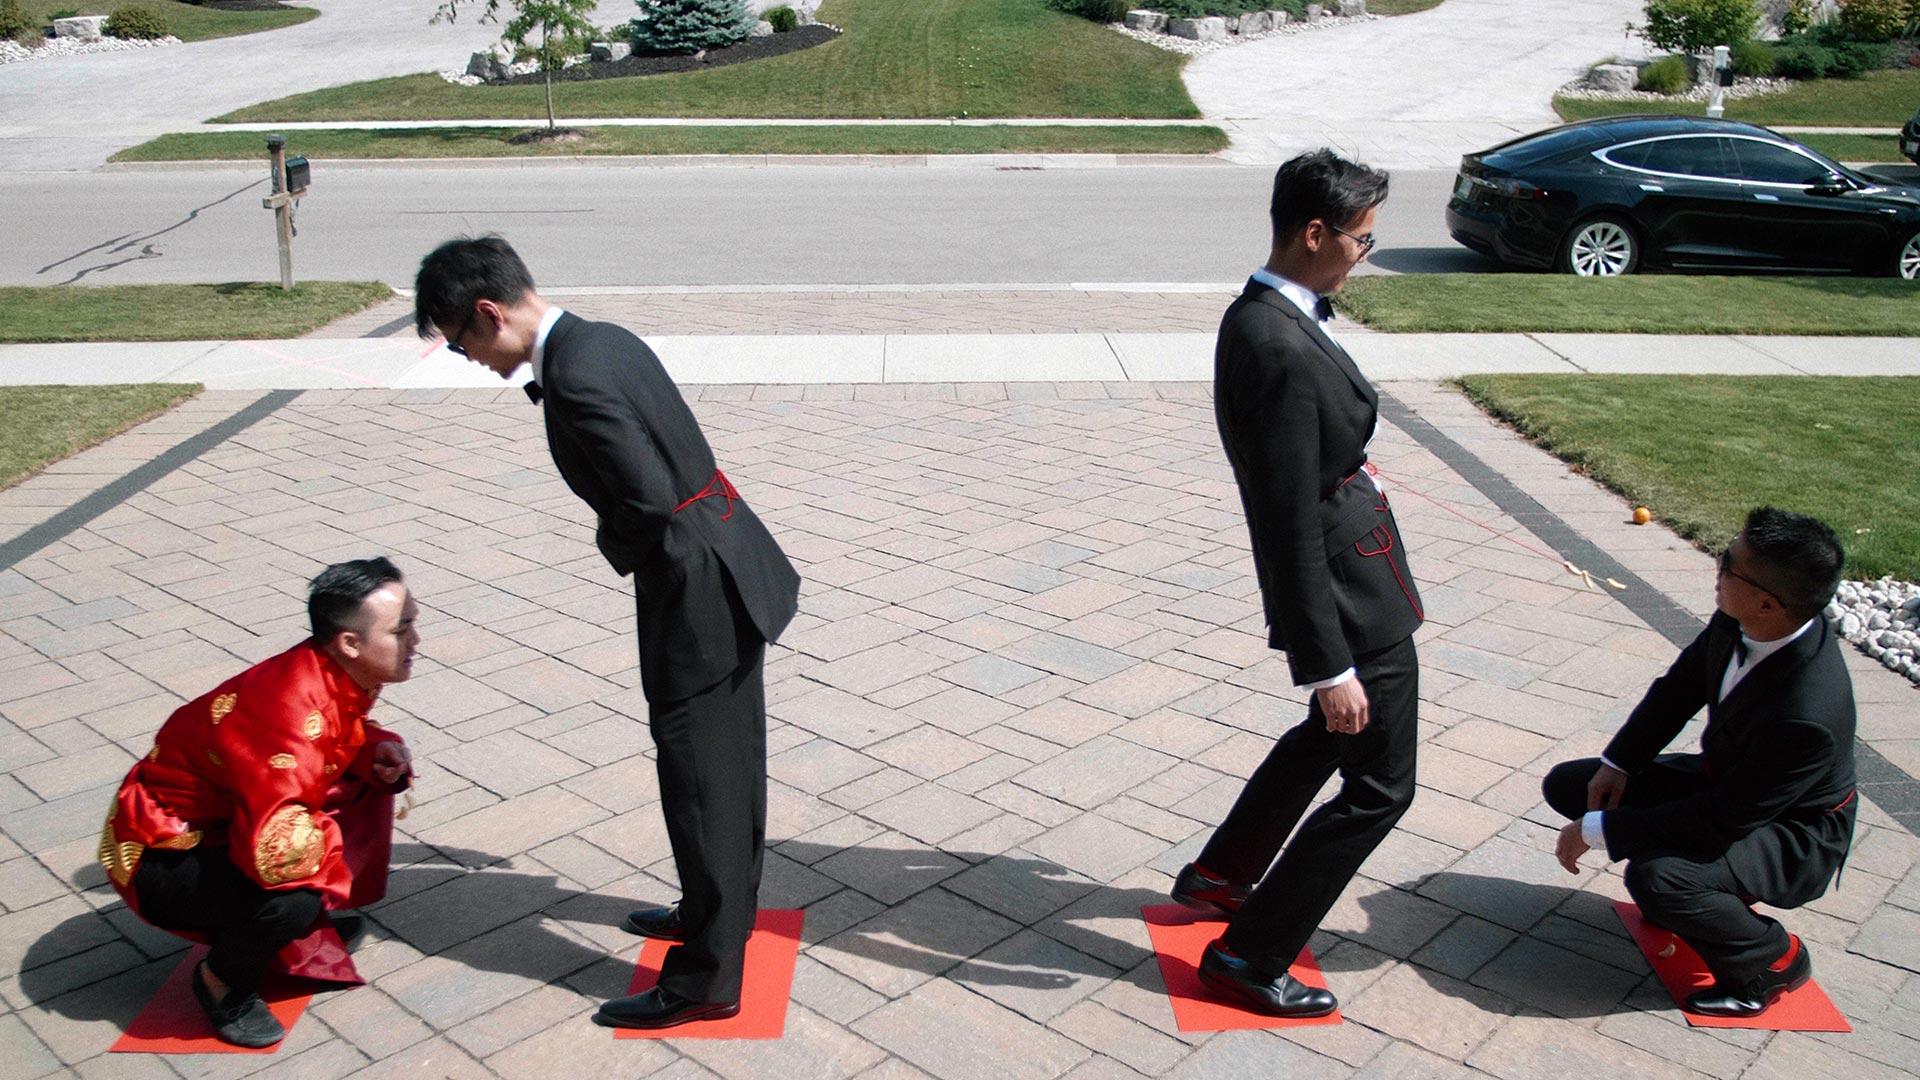 Chinese door games captured by Ontario Wedding Videographer Kismet Creative